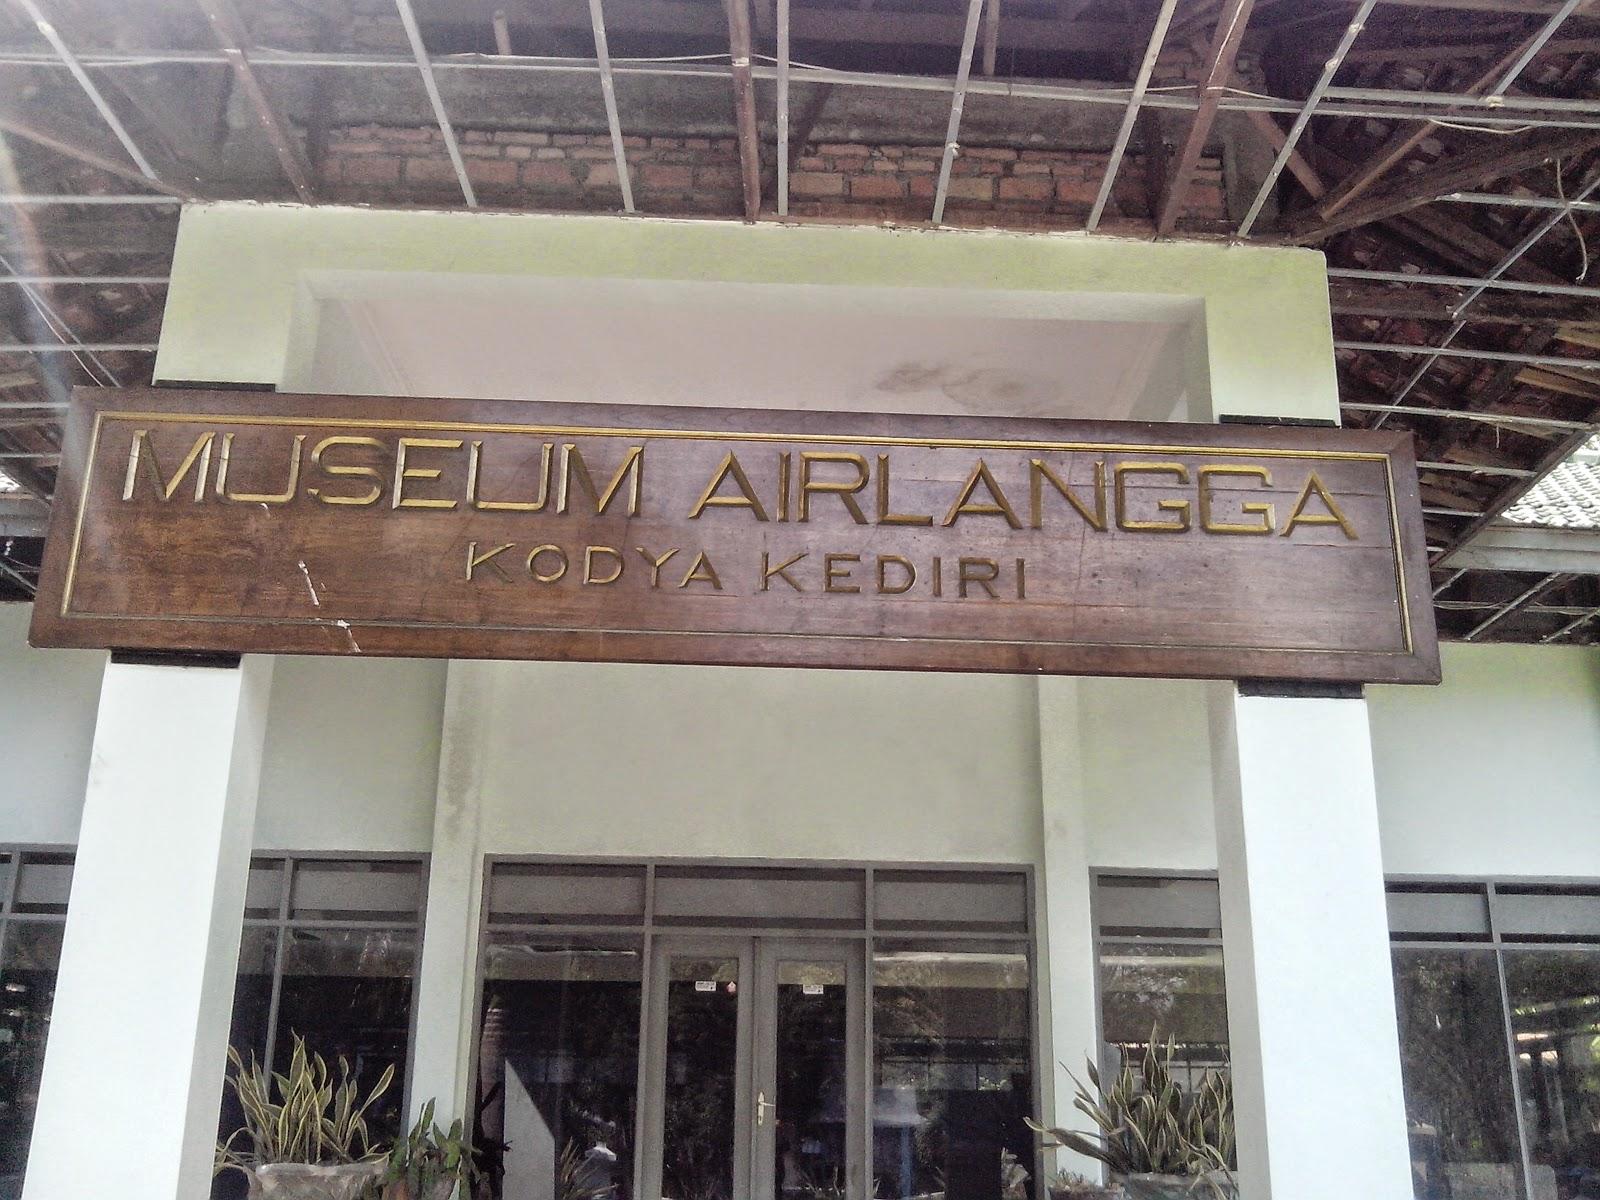 Museum Airlangga Kodya Kediri